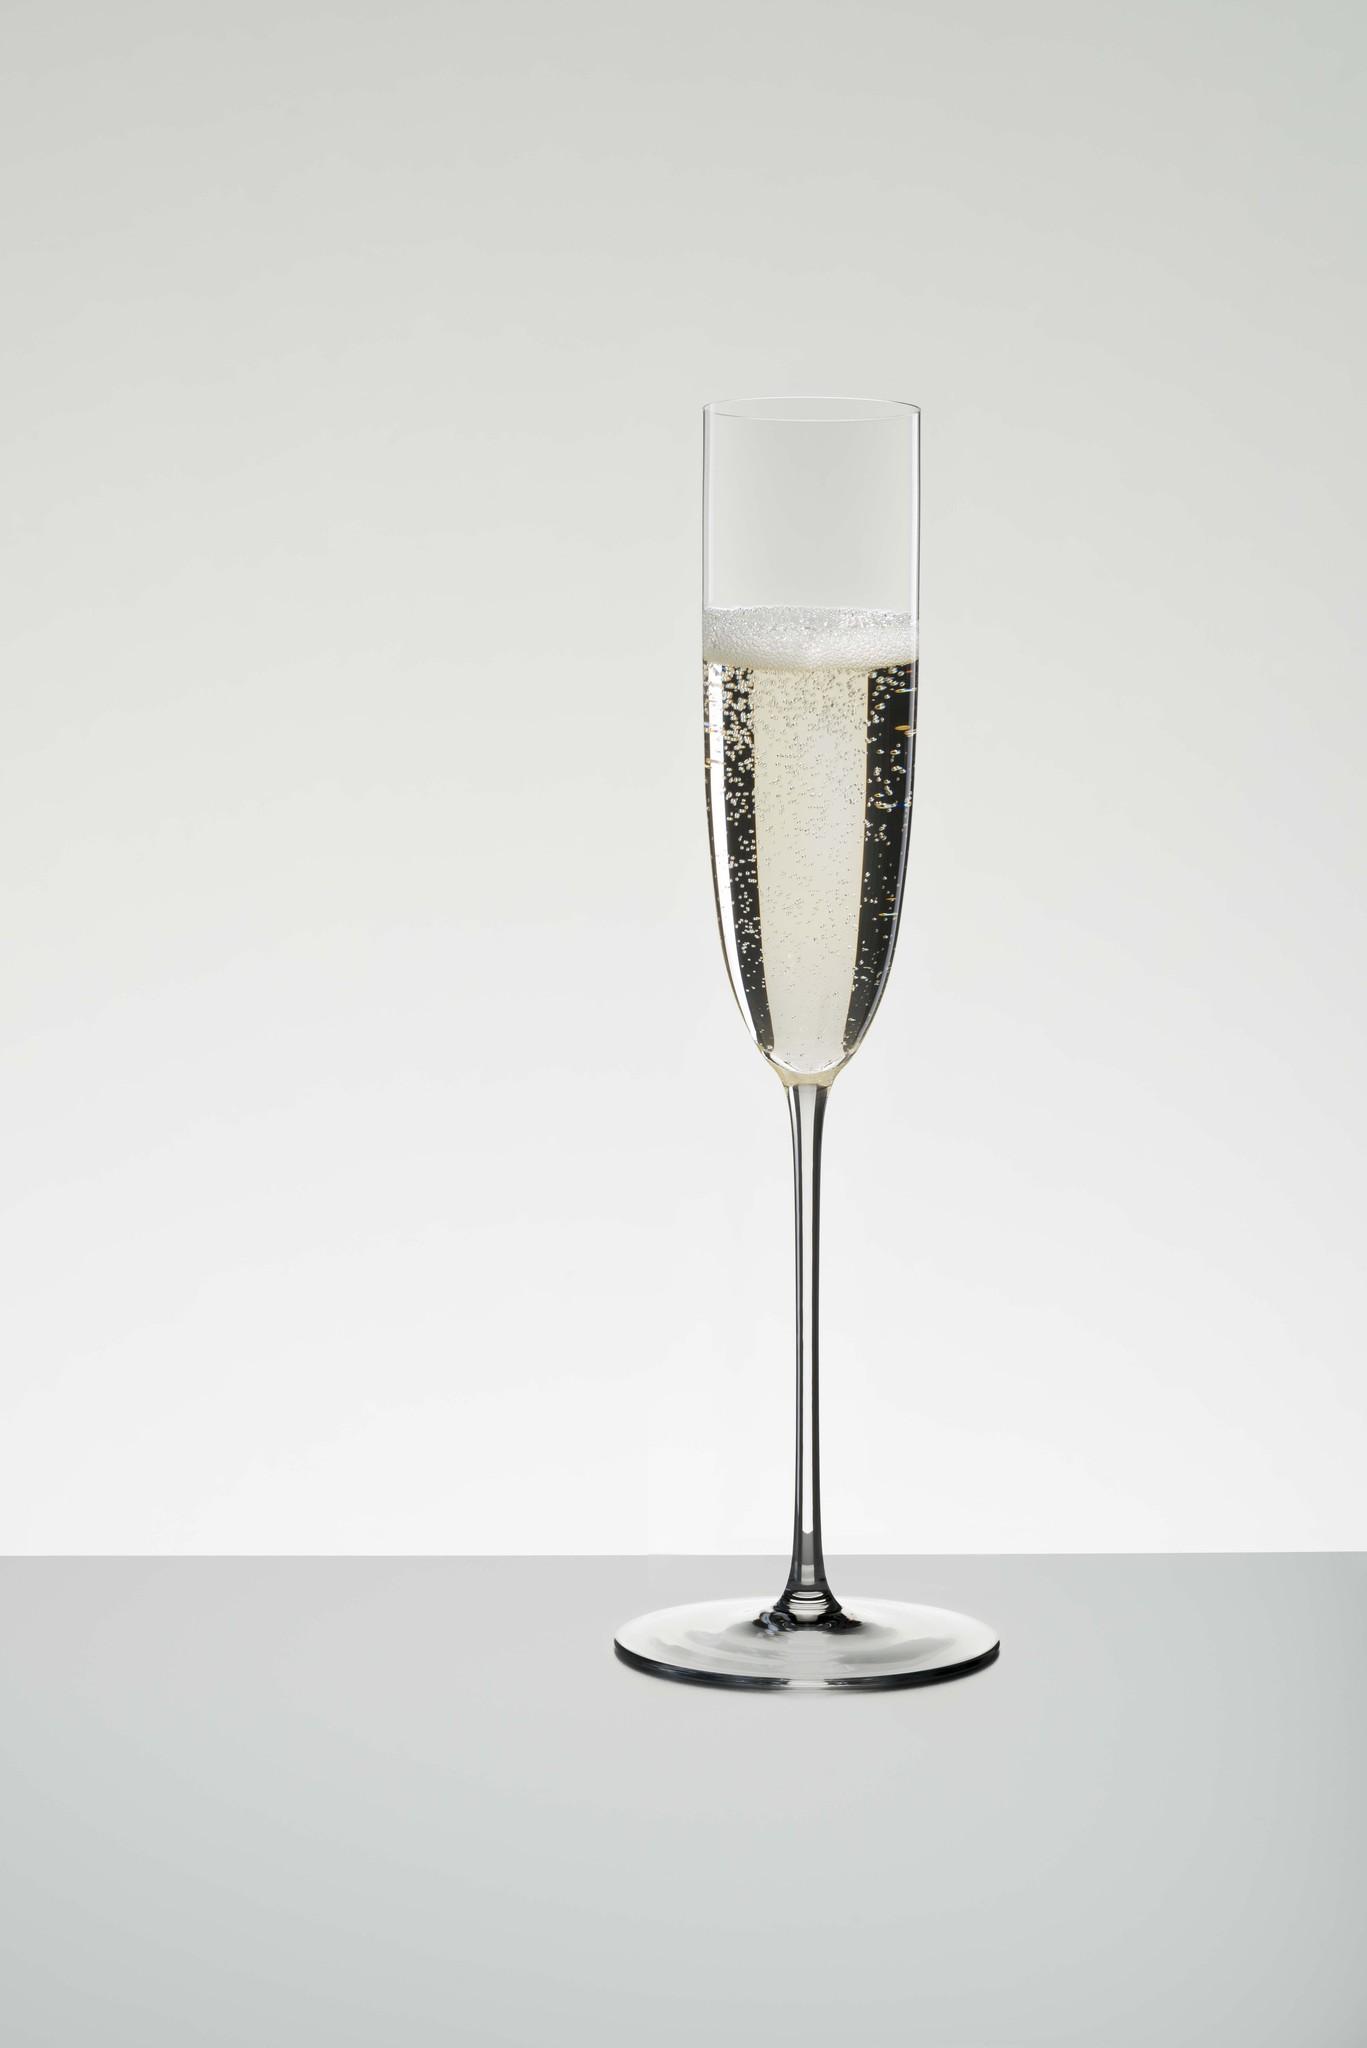 Бокалы Бокал для шампанского 170мл Riedel Superleggero Champagne Flute bokal-dlya-shampanskogo-170ml-riedel-superleggero-champagne-flute-avstriya.jpg